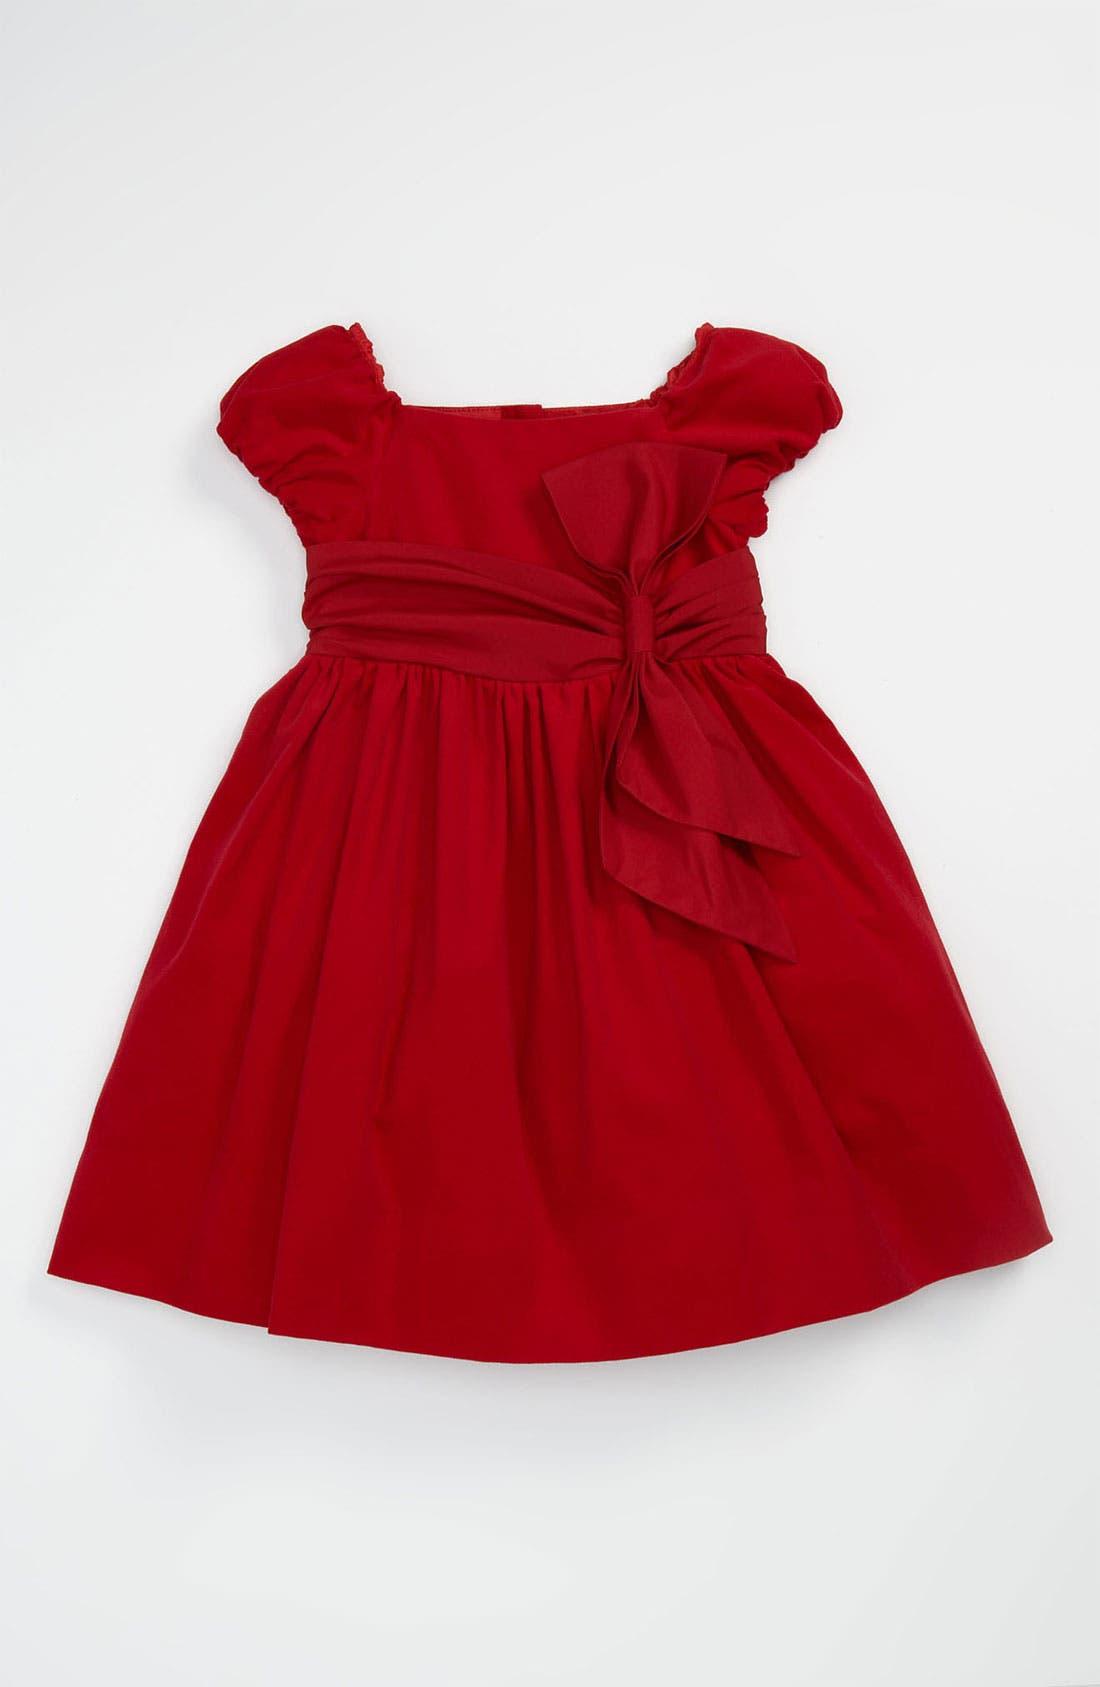 Alternate Image 1 Selected - Ralph Lauren Corduroy Party Dress (Toddler)